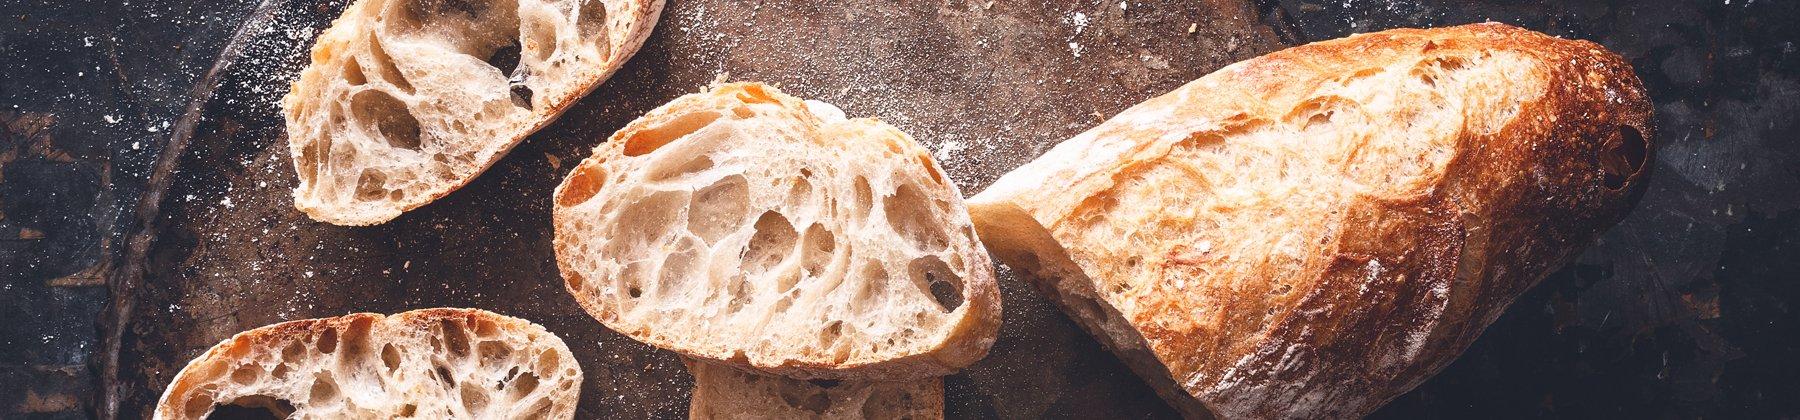 Photo of baguette bread.